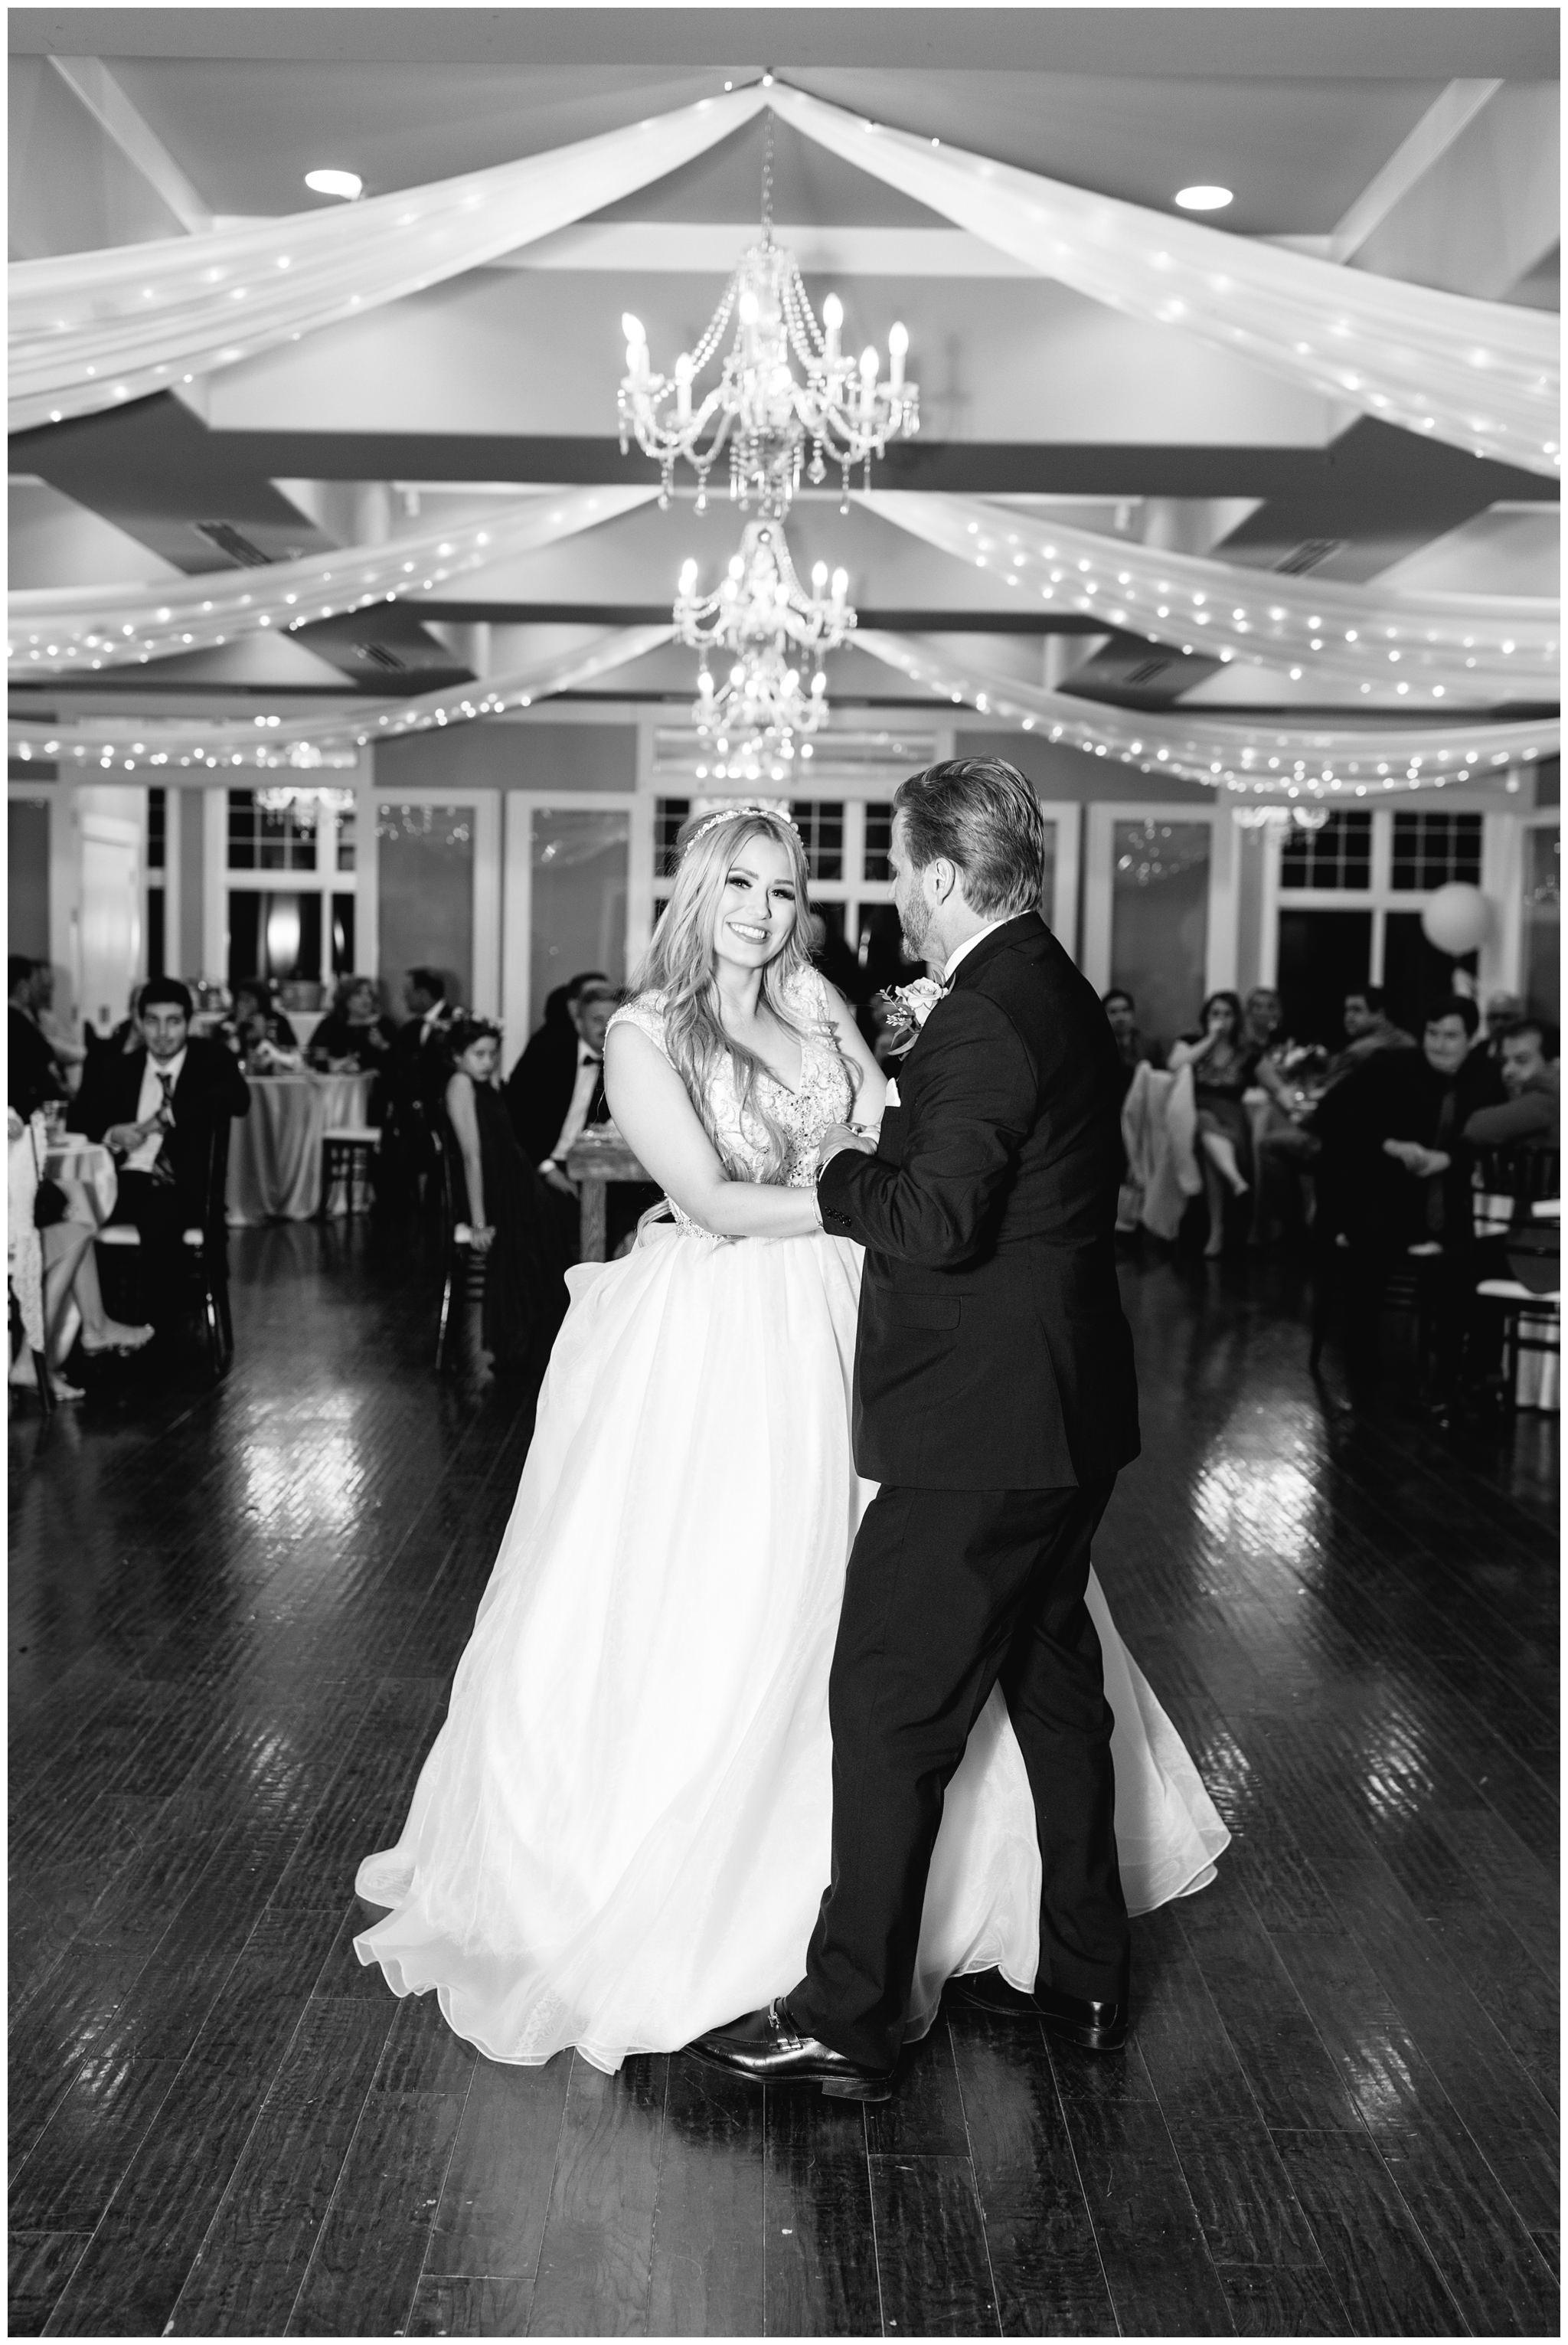 Daddy daughter dance at utah wedding